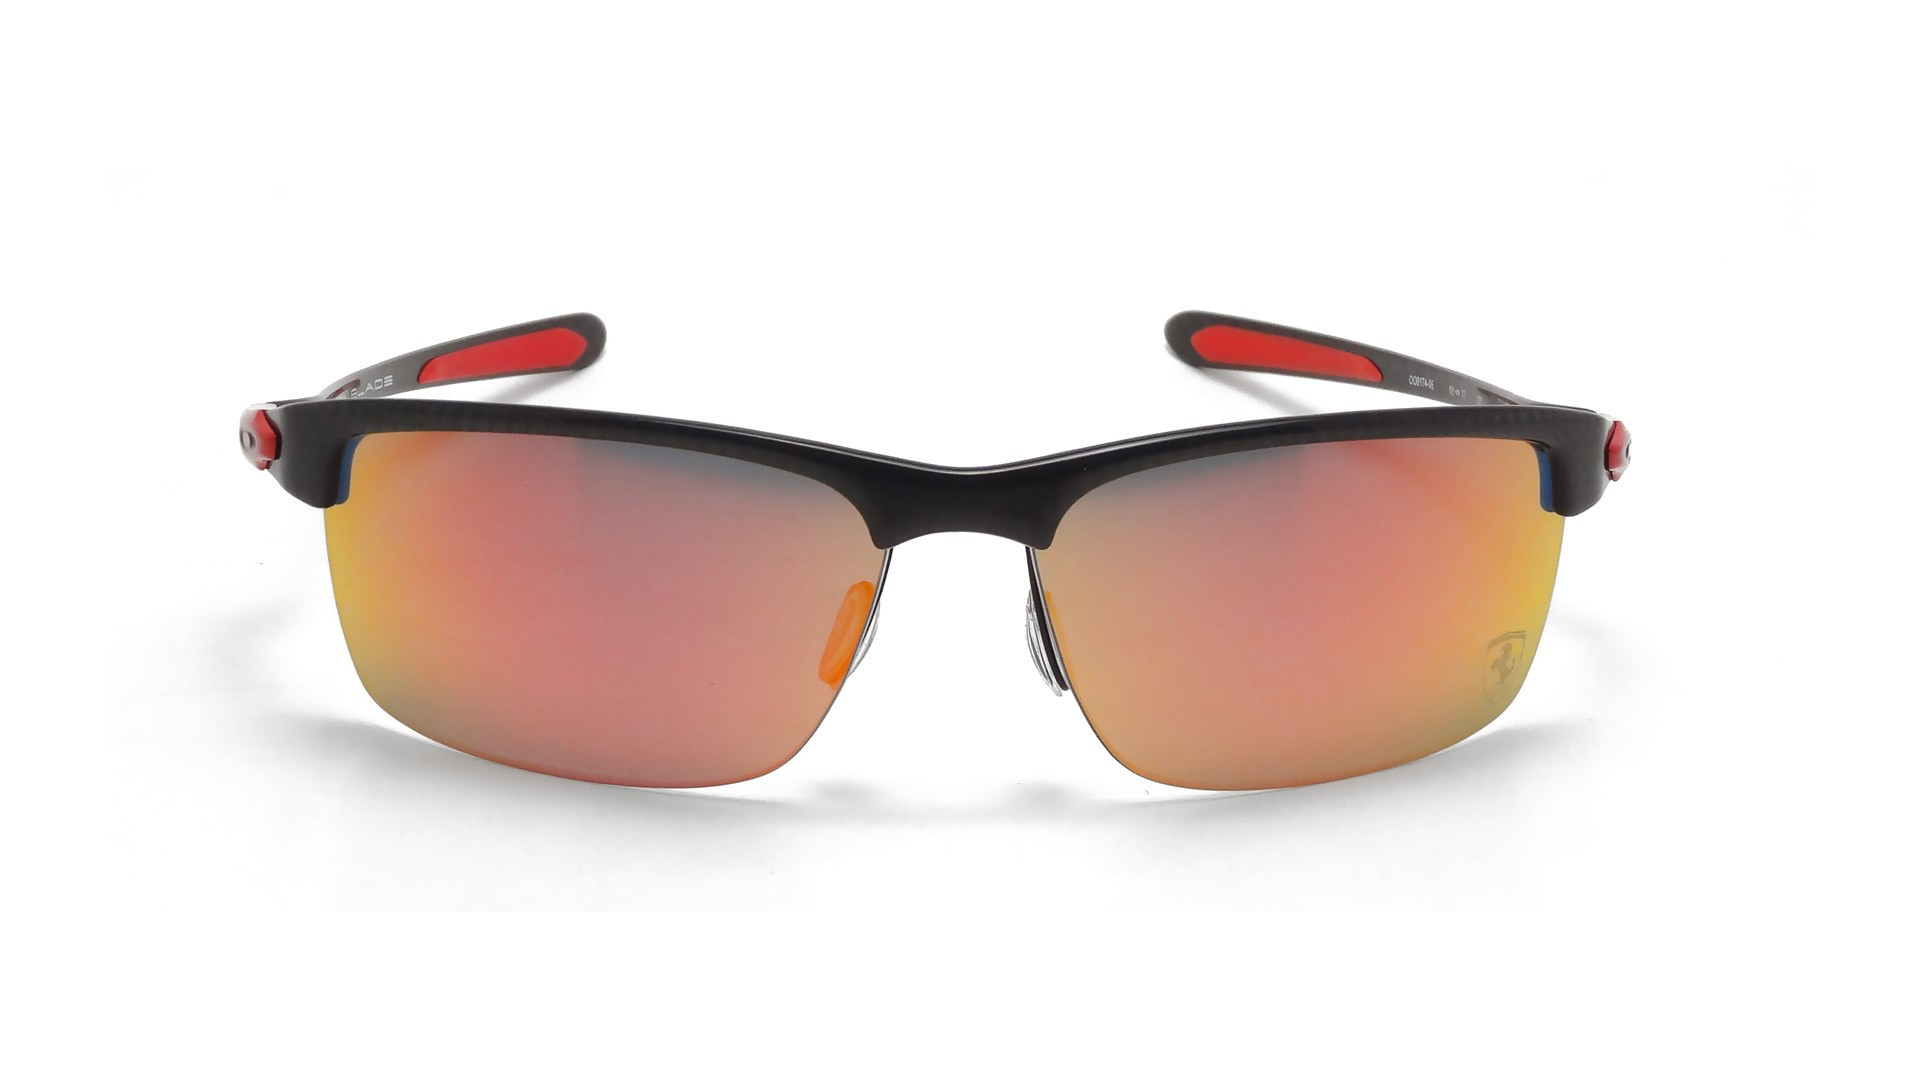 7492ad03c1 Oakley Ferrari Carbon Blade Replacement Lenses